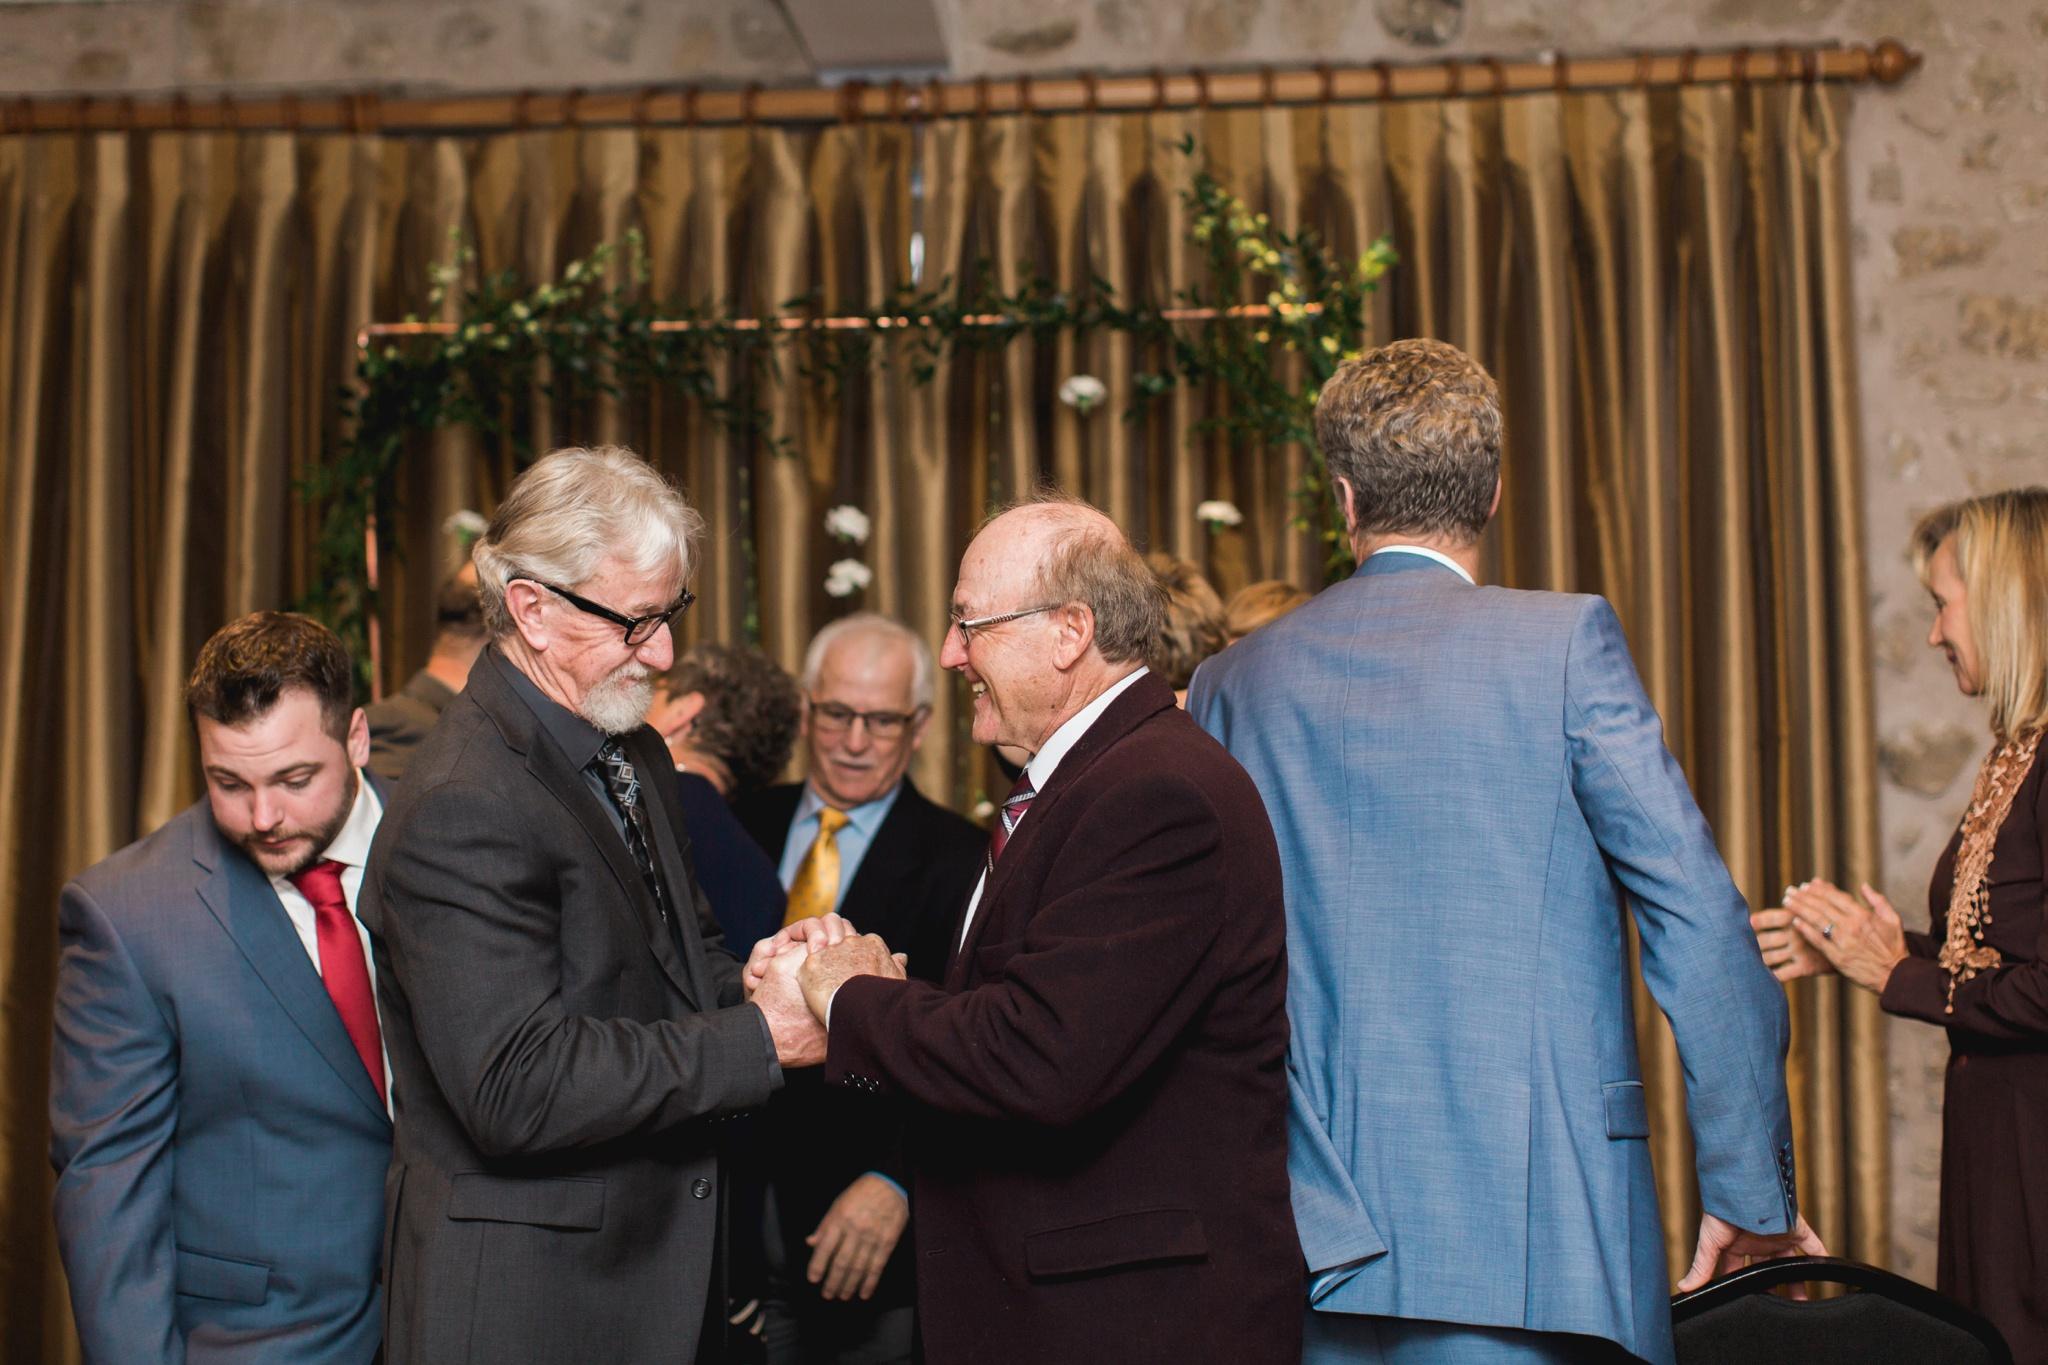 Toronto Wedding Photographer, Millcroft Spa Wedding